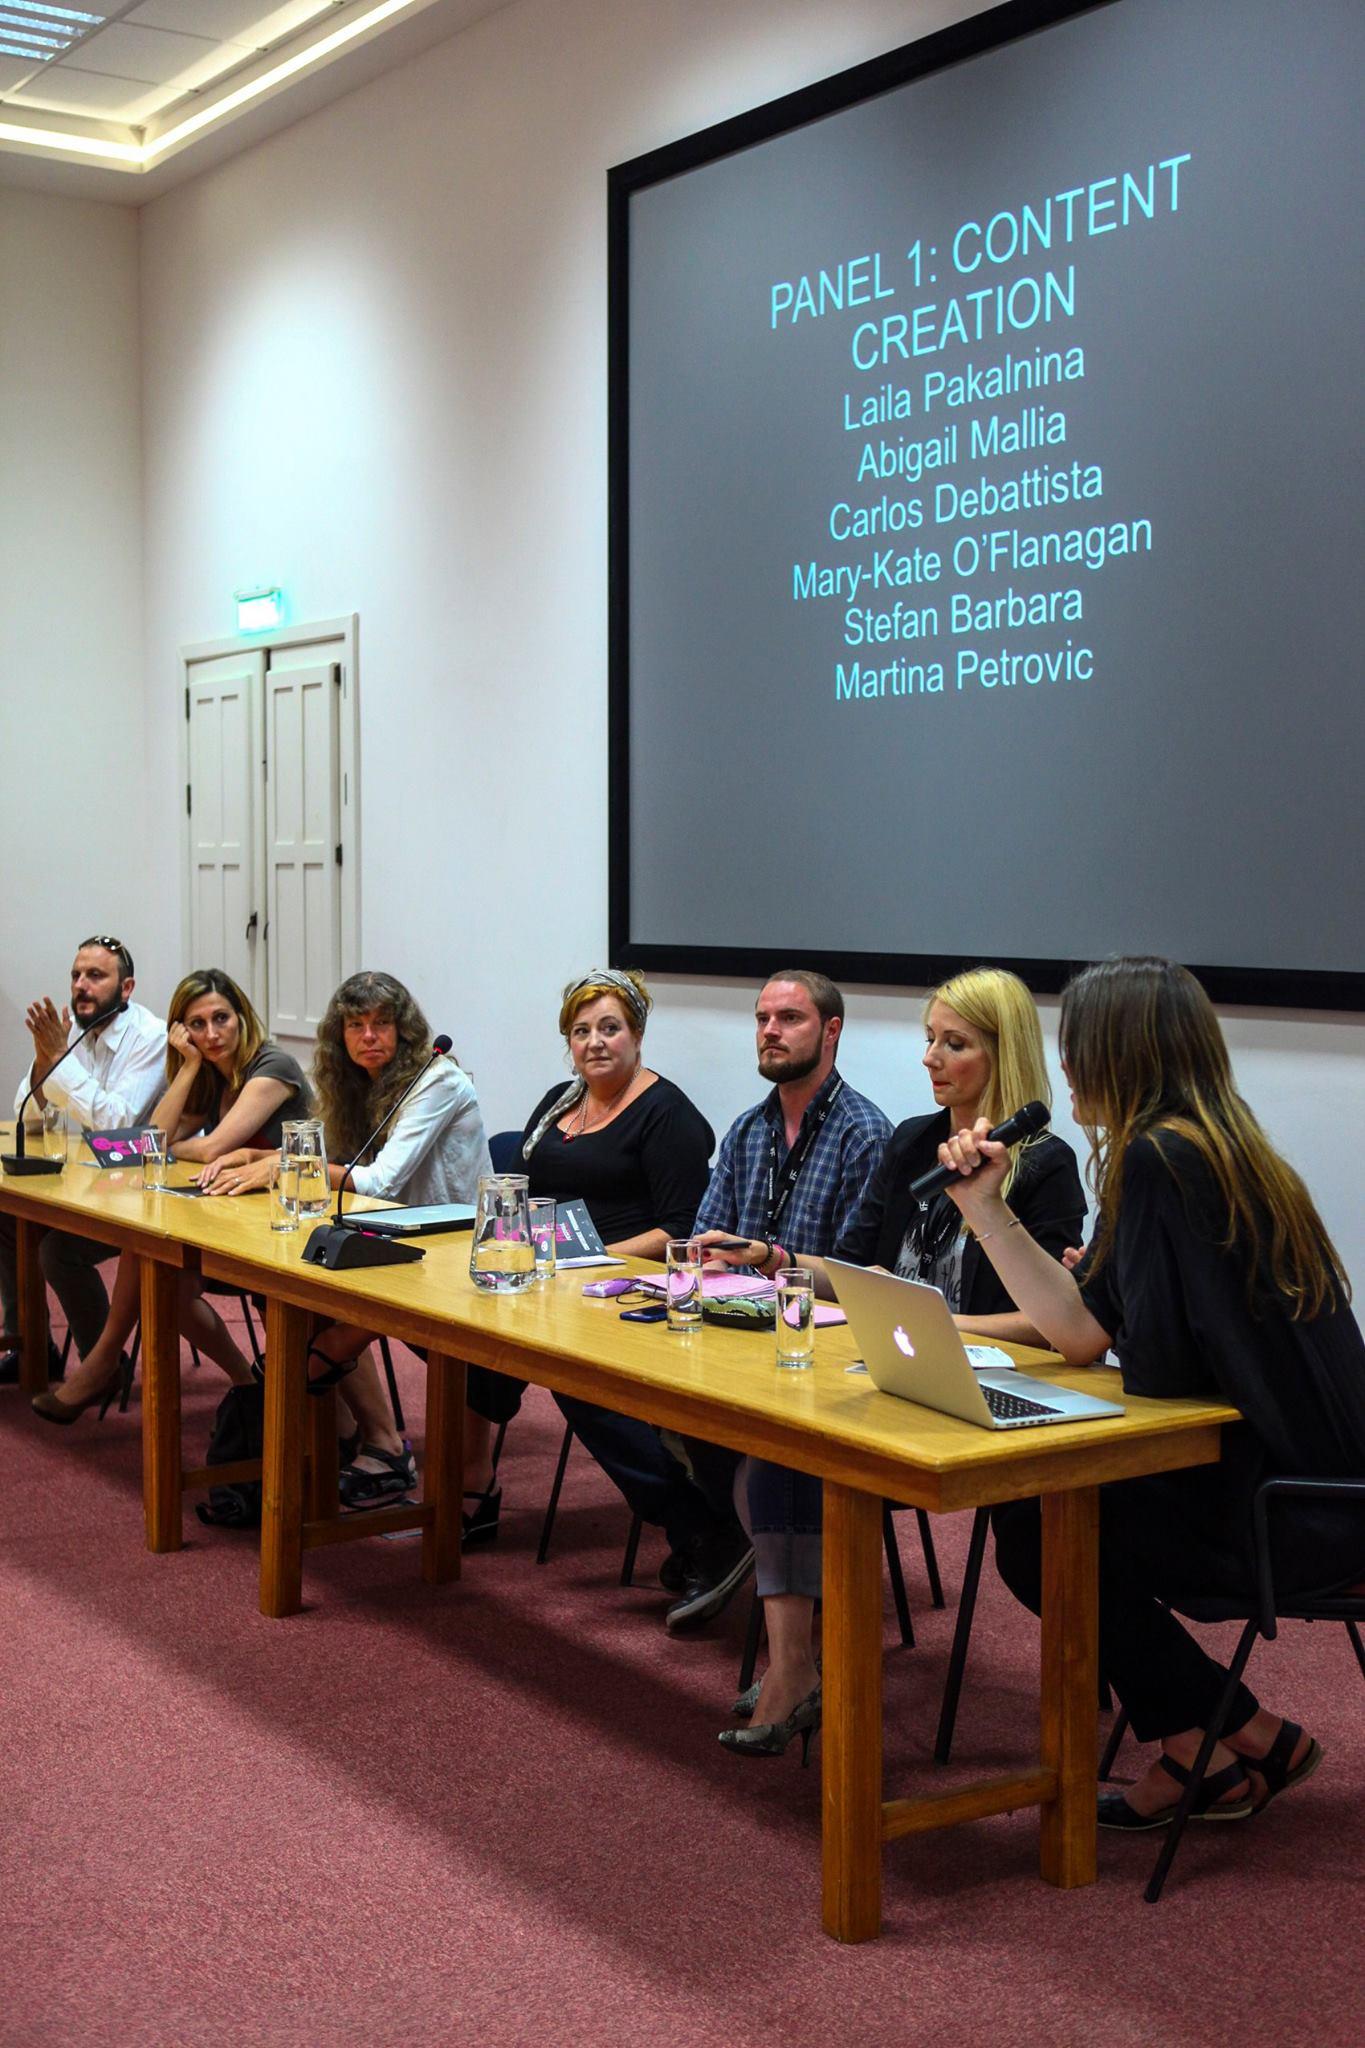 conference-malta-content-creation